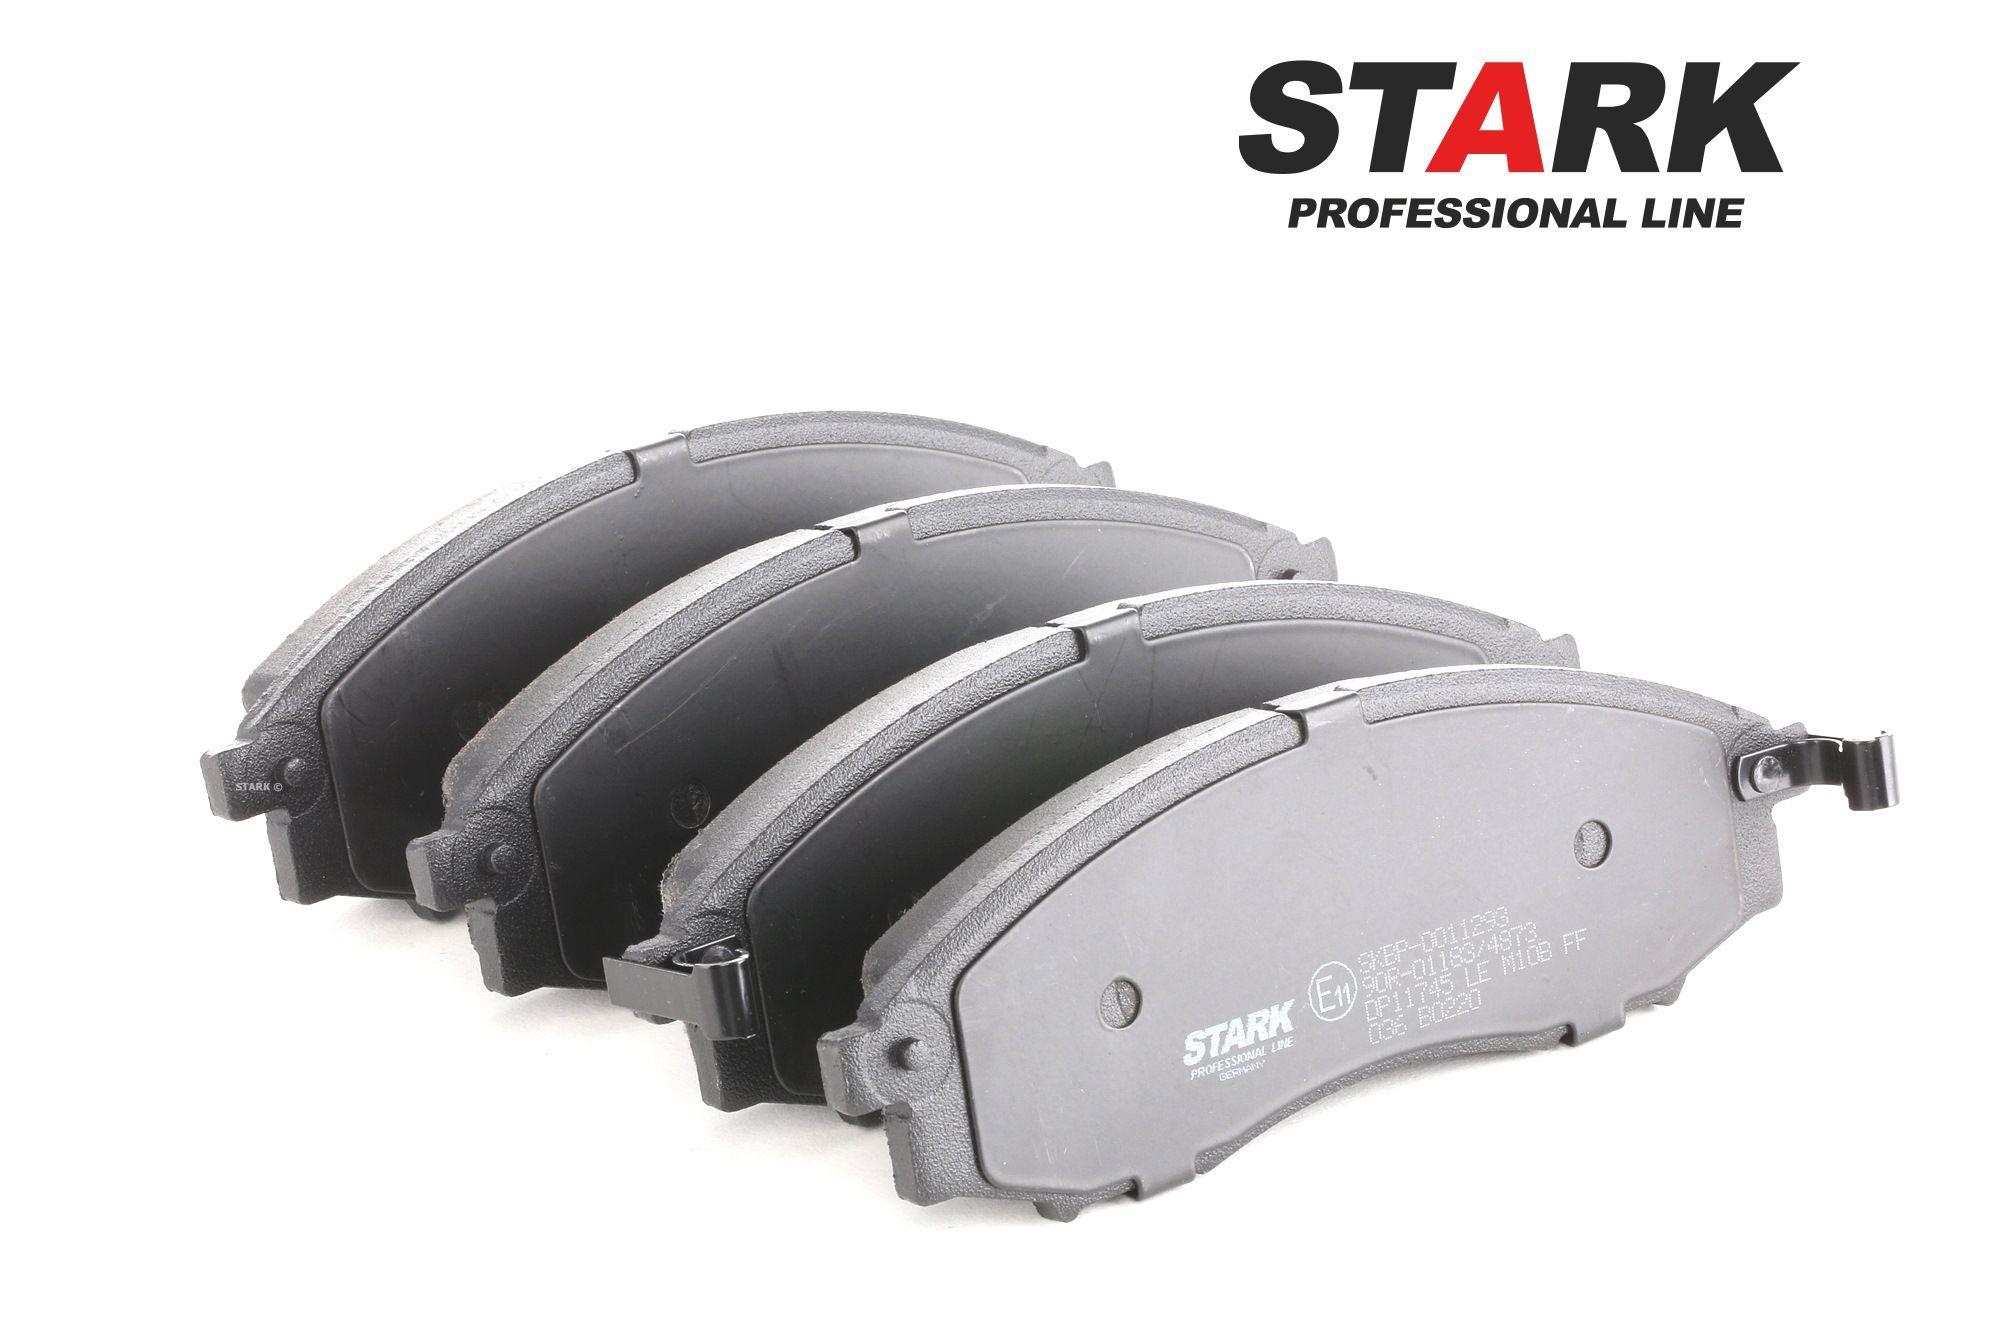 NISSAN NP300 PICKUP 2014 Bremsbelagsatz - Original STARK SKBP-0011293 Höhe: 56,65mm, Dicke/Stärke: 16,2mm